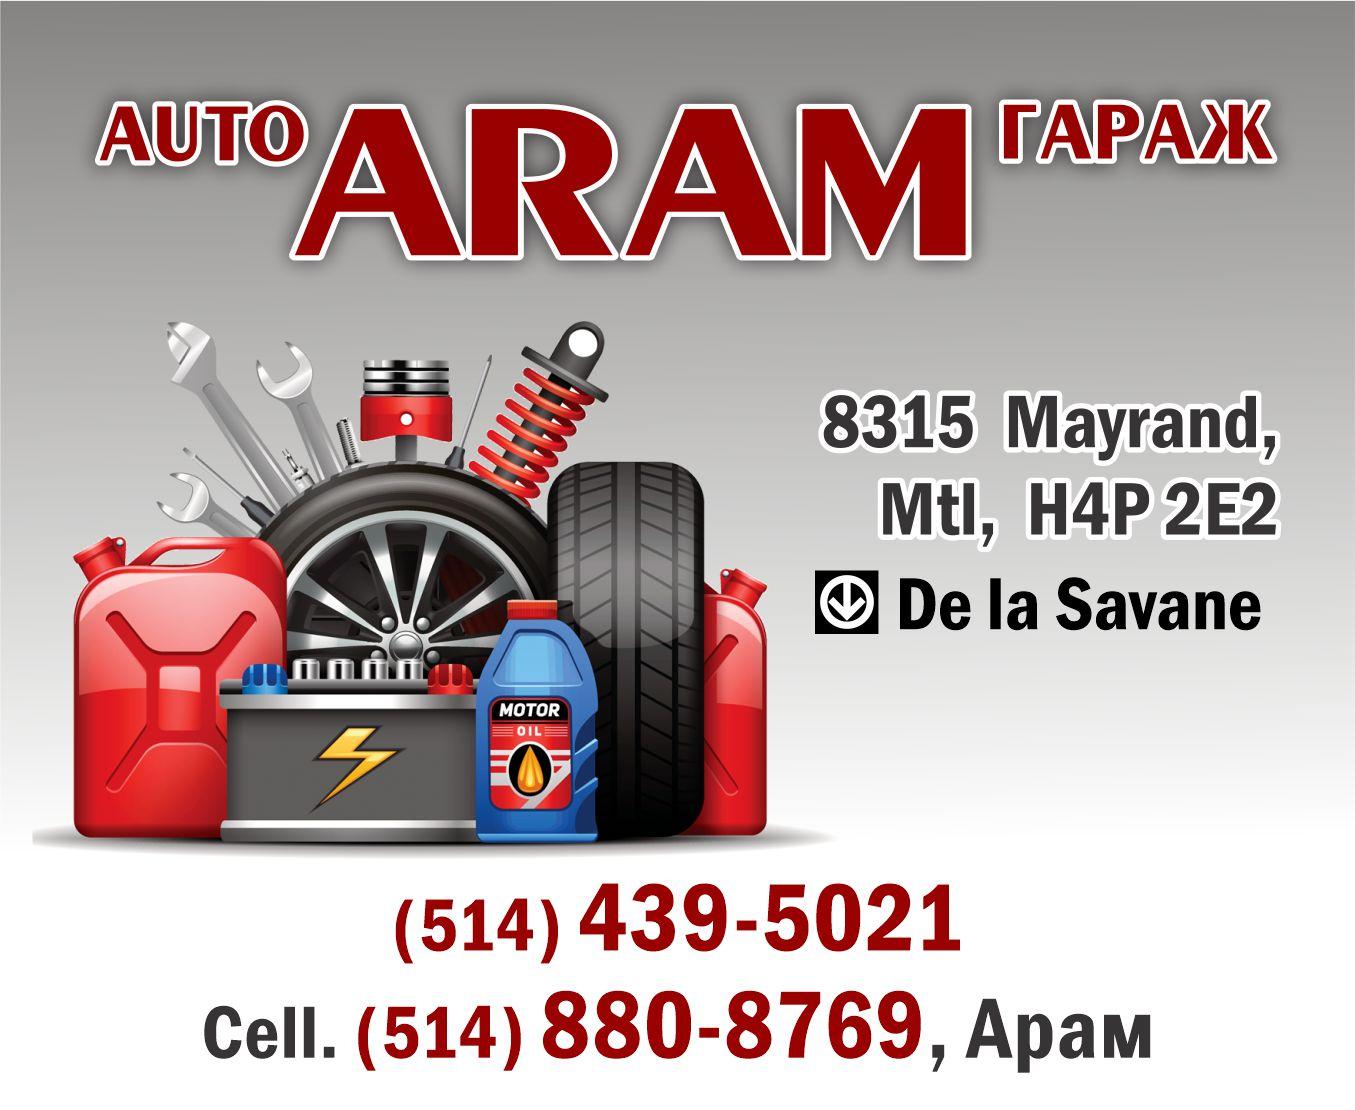 Aram garage Автосервис, гараж в Монреале